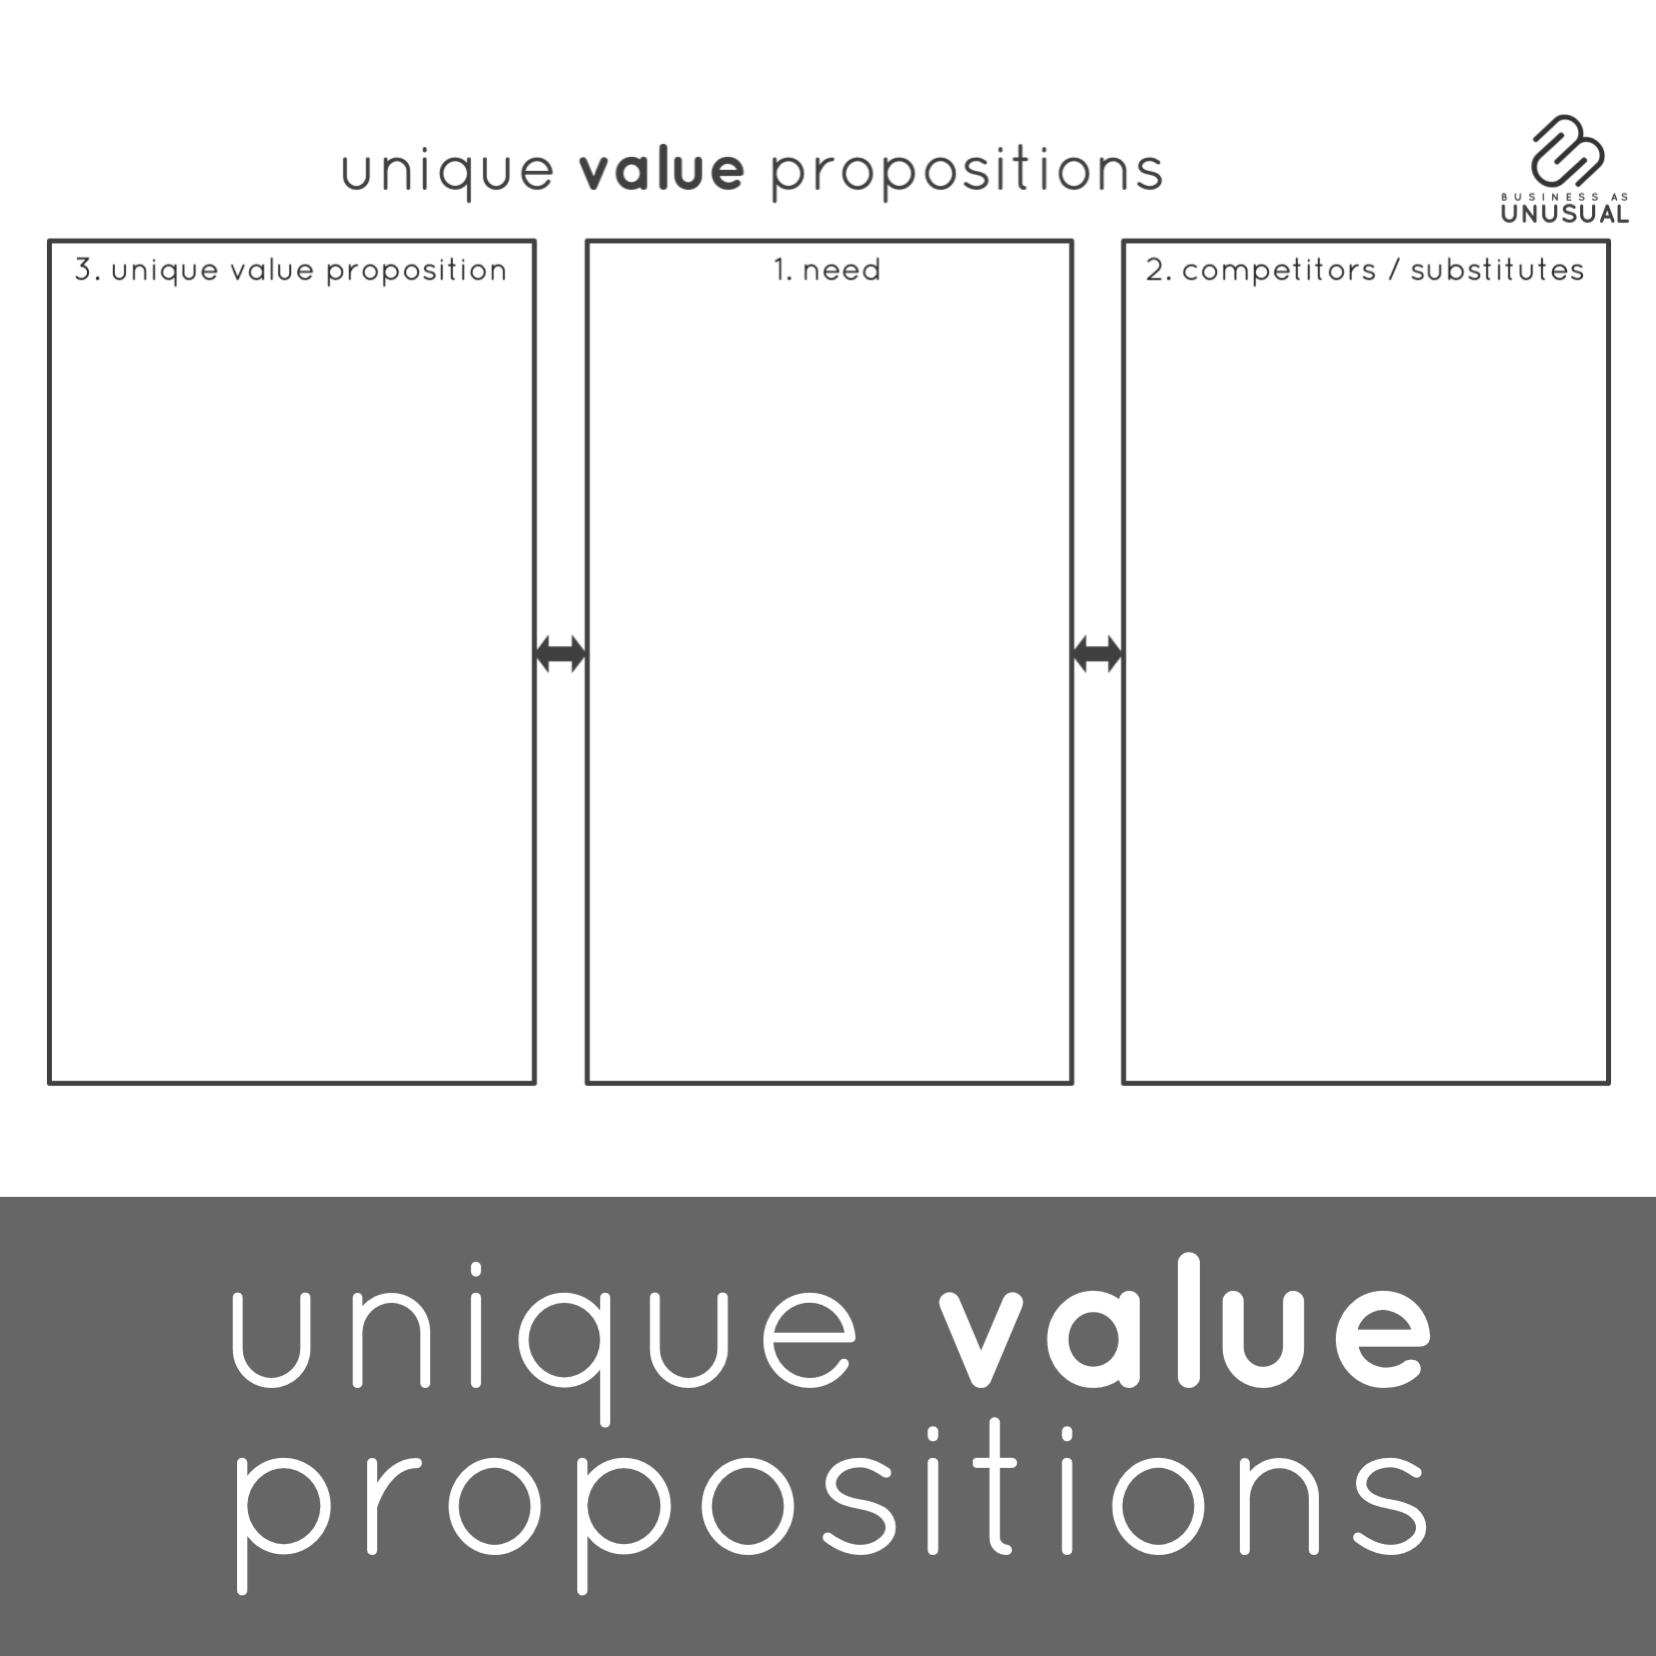 Unusual Games - Unique Value Propositions